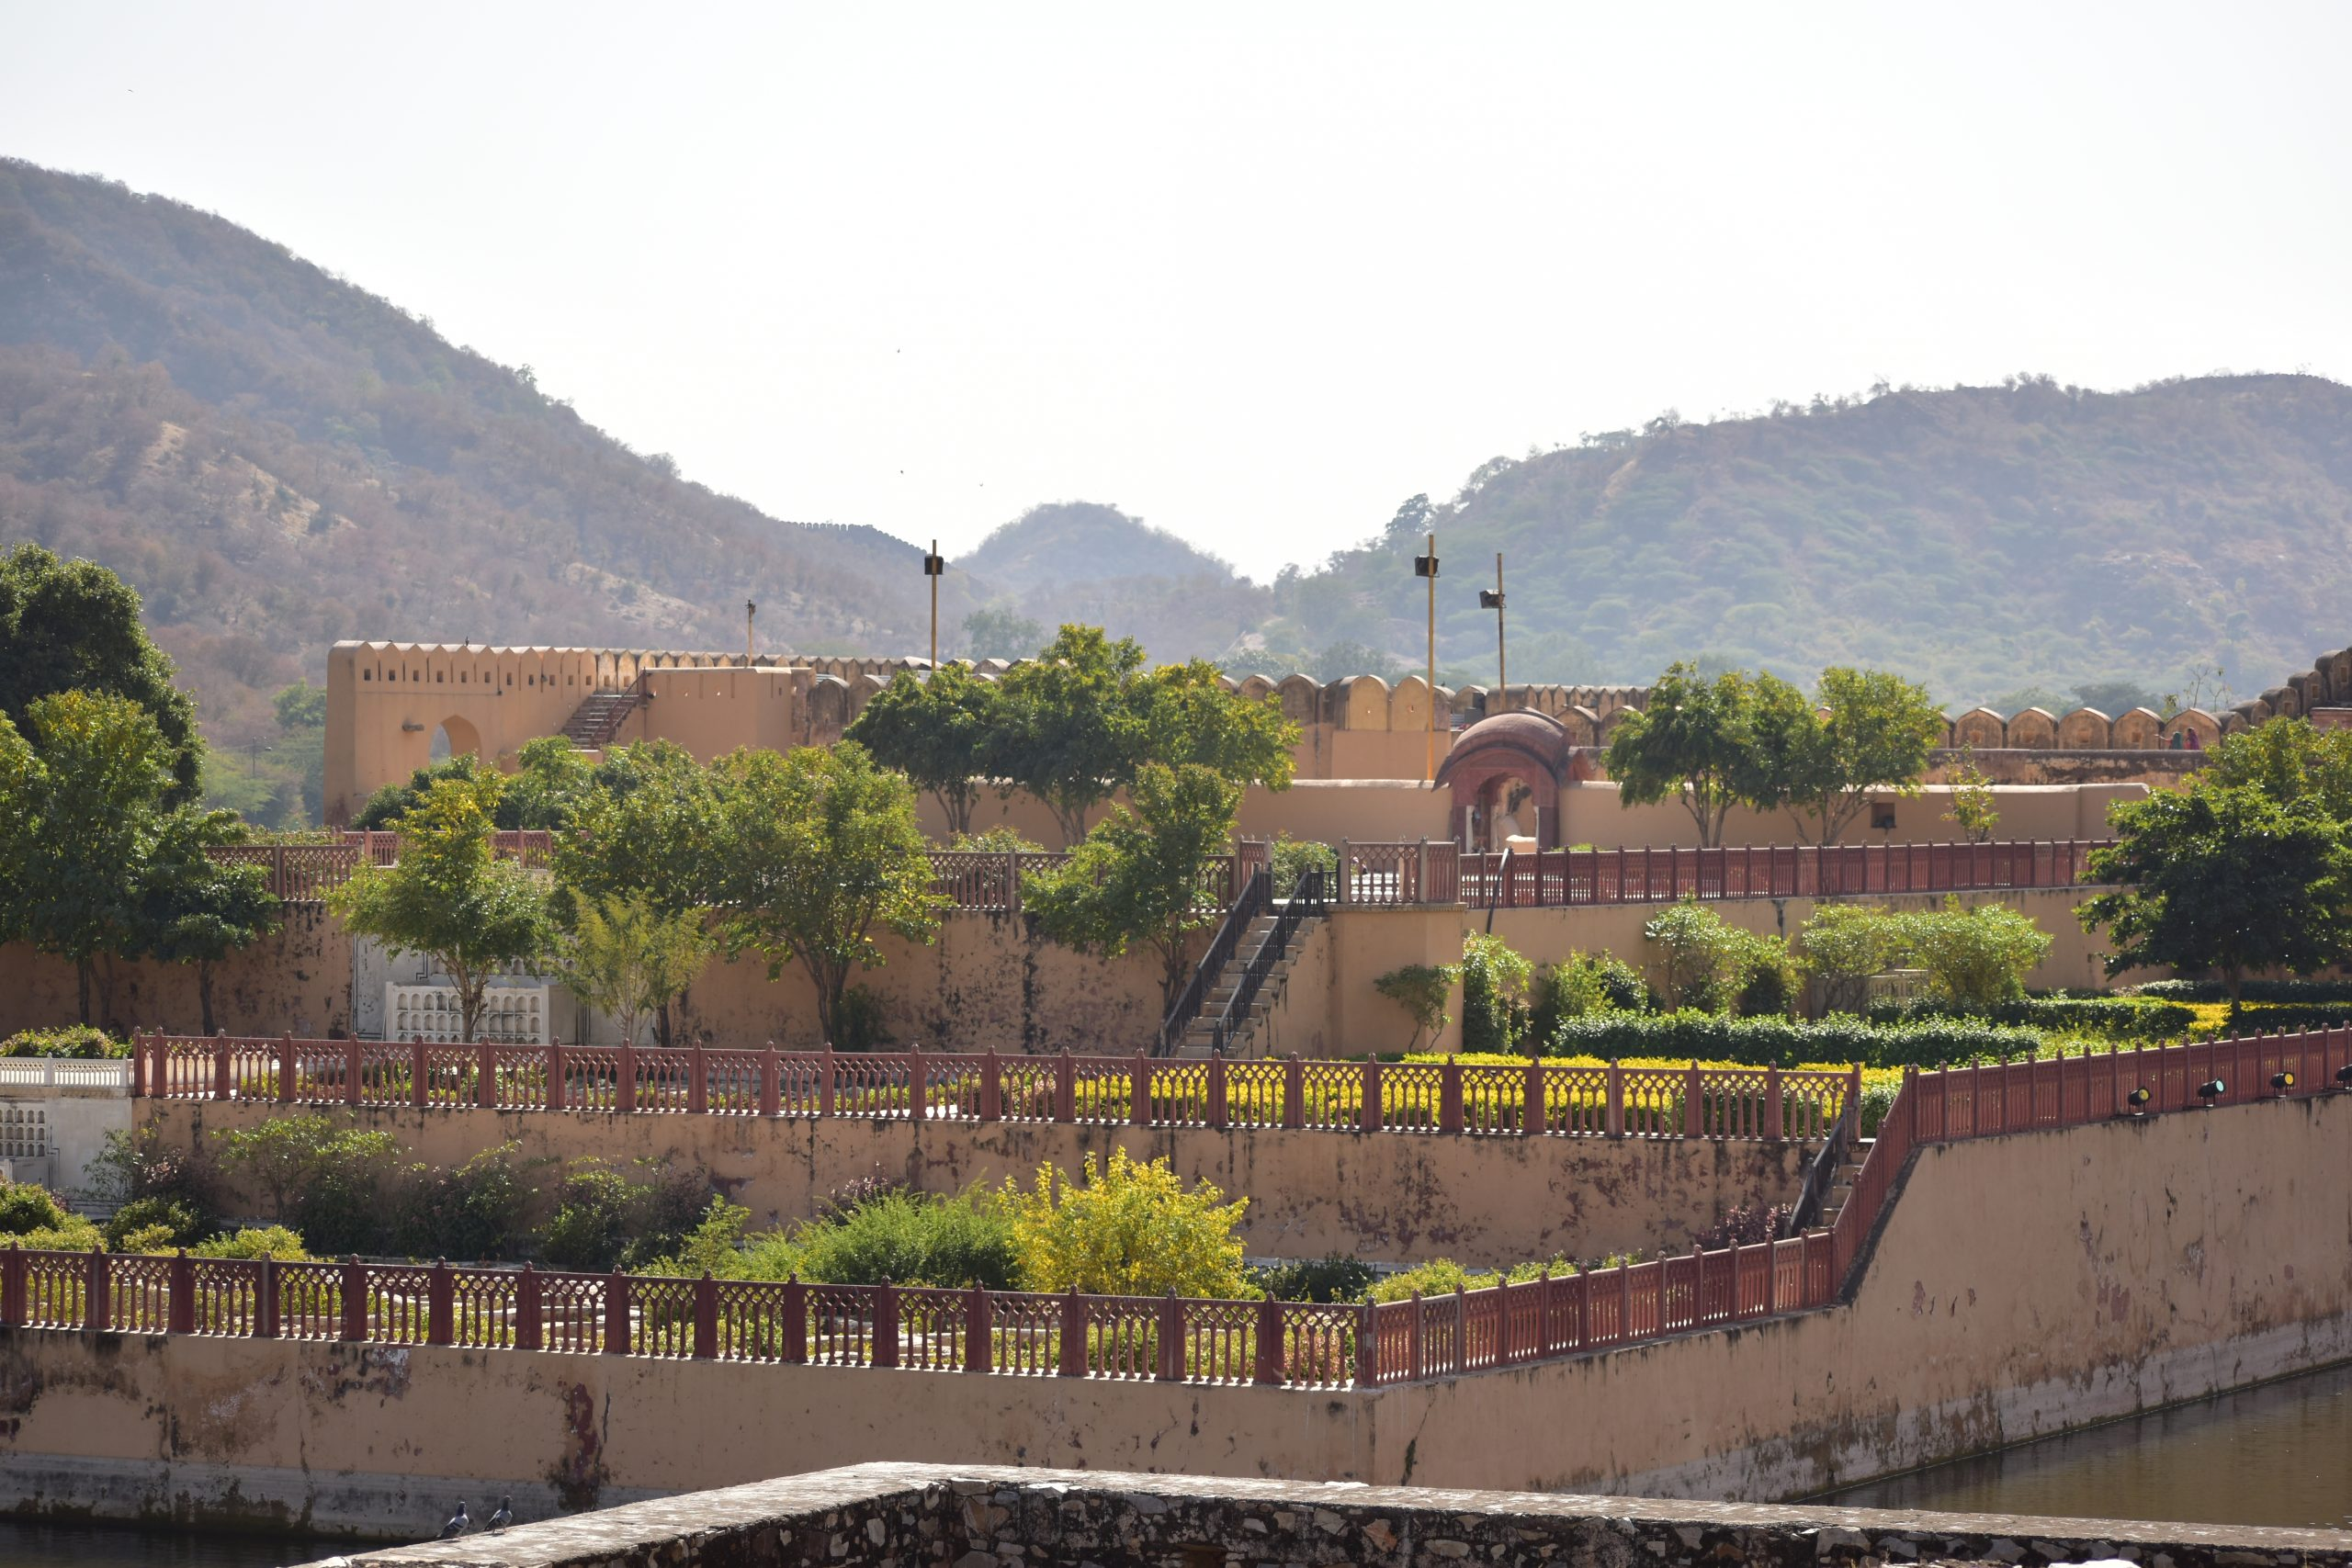 Park at Amer fort